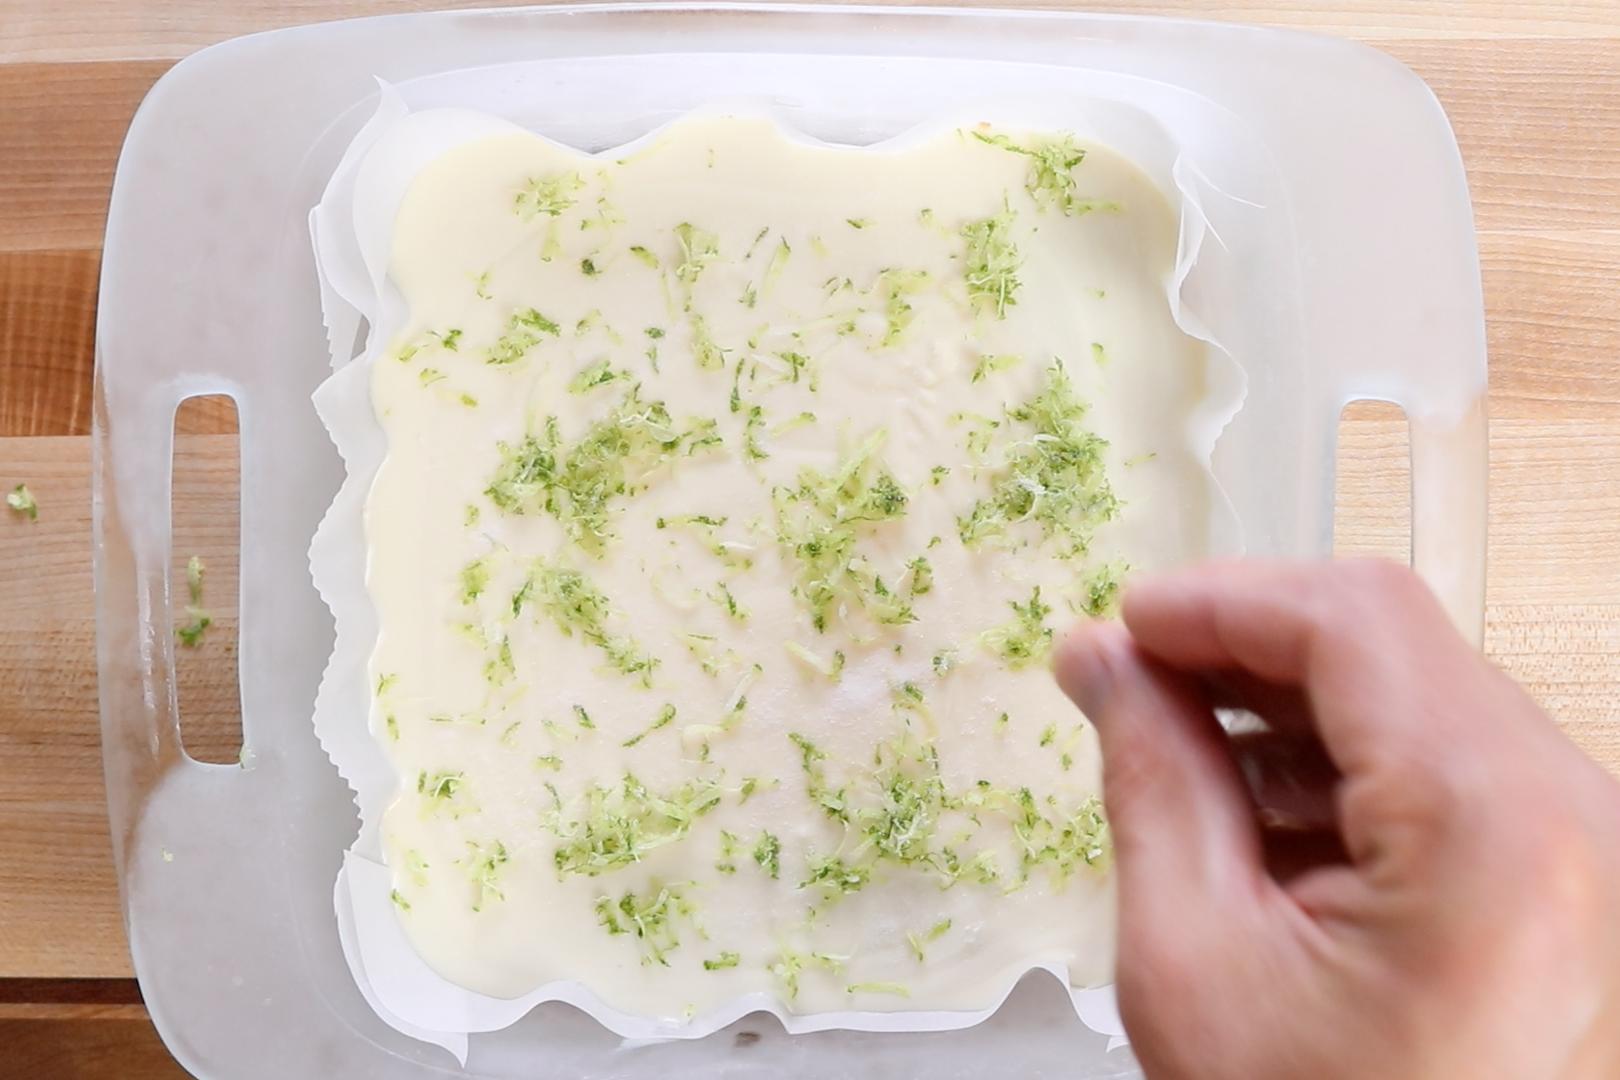 11. Add a garnish of lime zest and sugar/salt mixture if desired. -